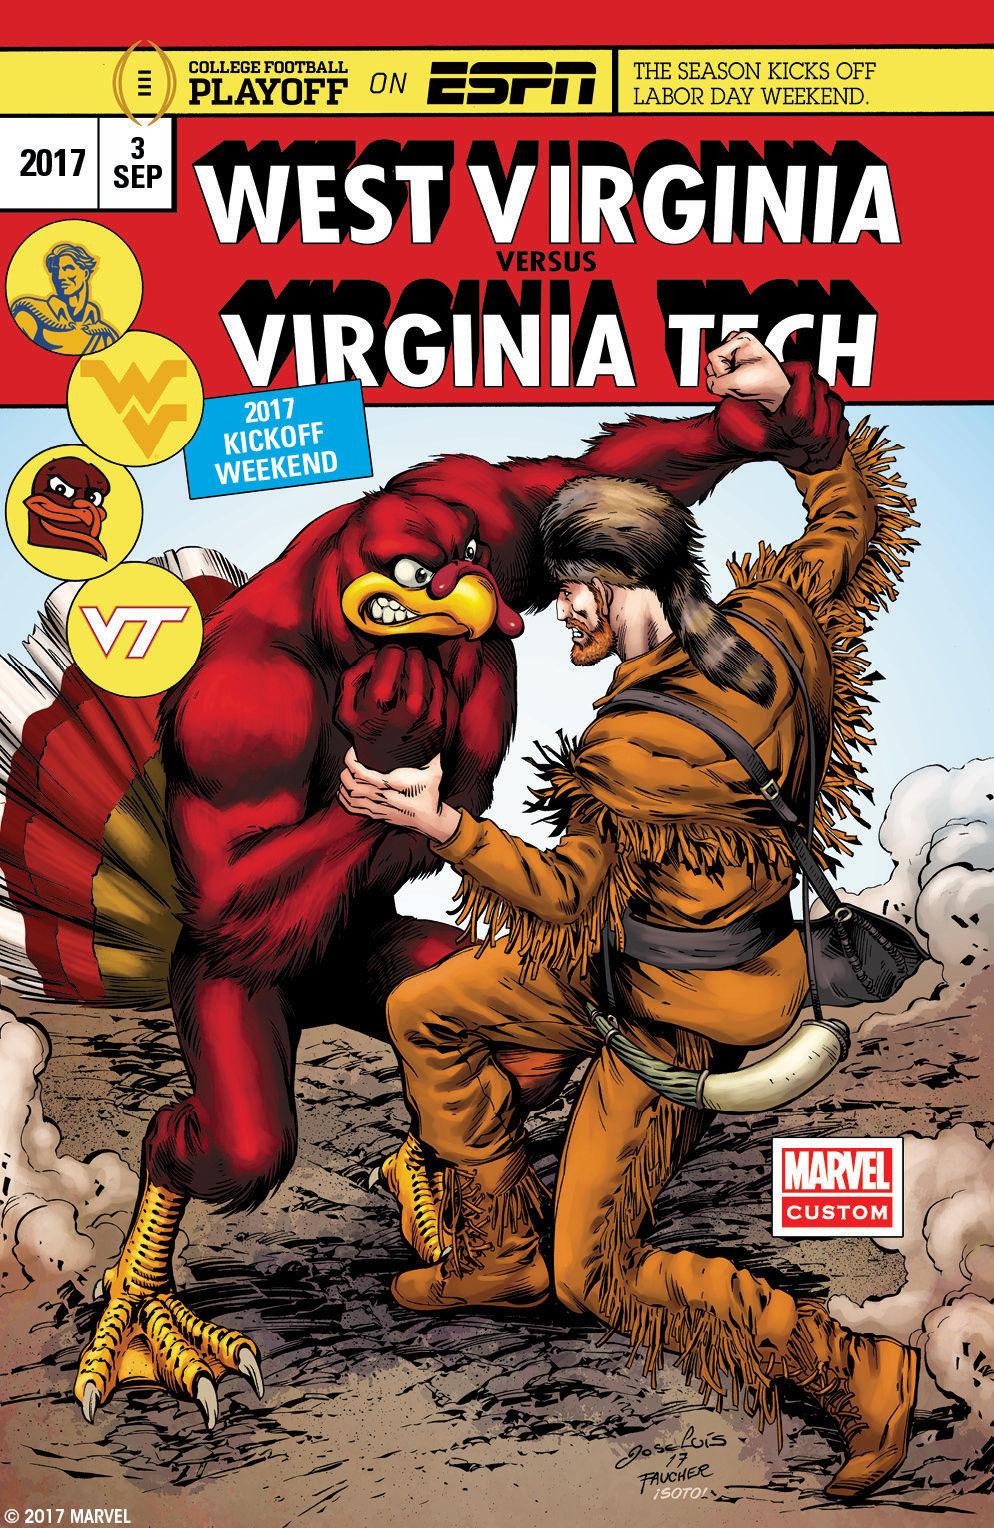 Comic Book Cover Artist Jobs ~ Marvel comic book artist draws cover for hokies